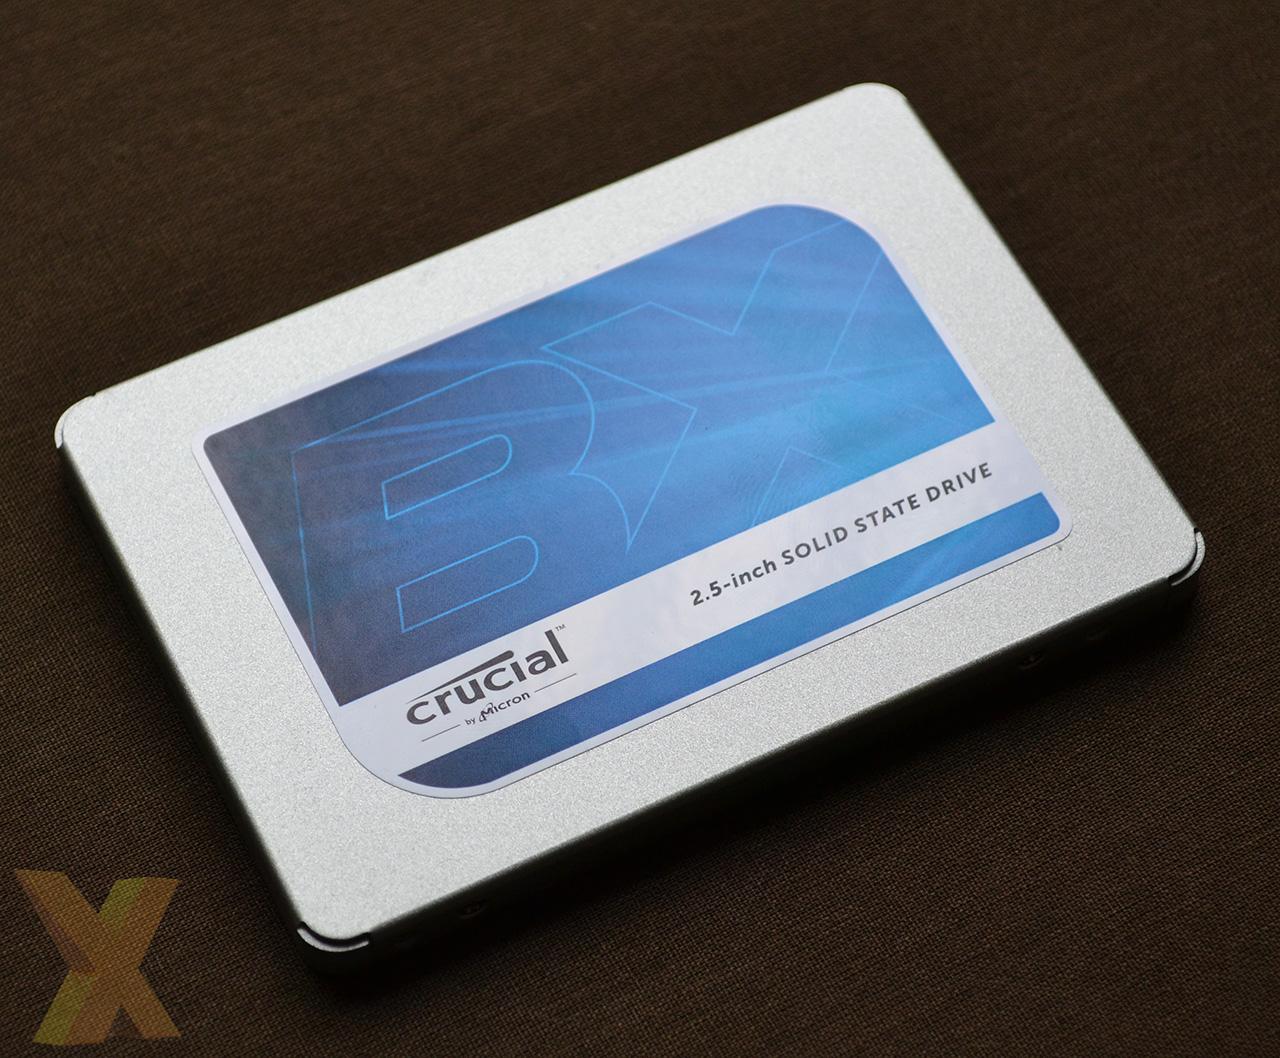 Review: Crucial BX300 (480GB) - Storage - HEXUS net